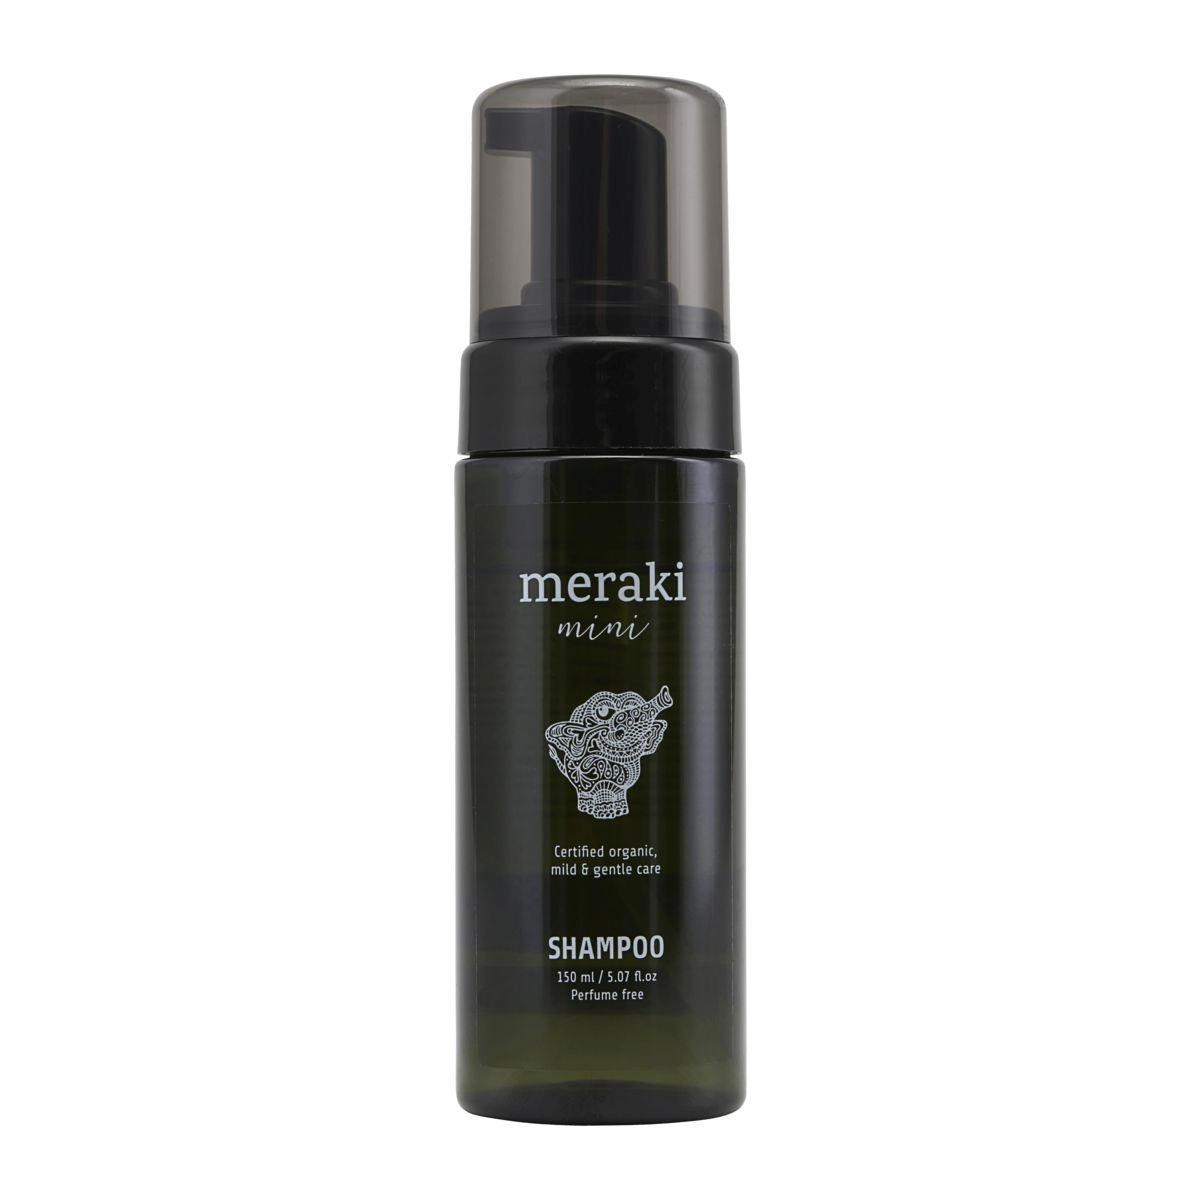 meraki Dětský šampon Meraki mini 150 ml, zelená barva, plast